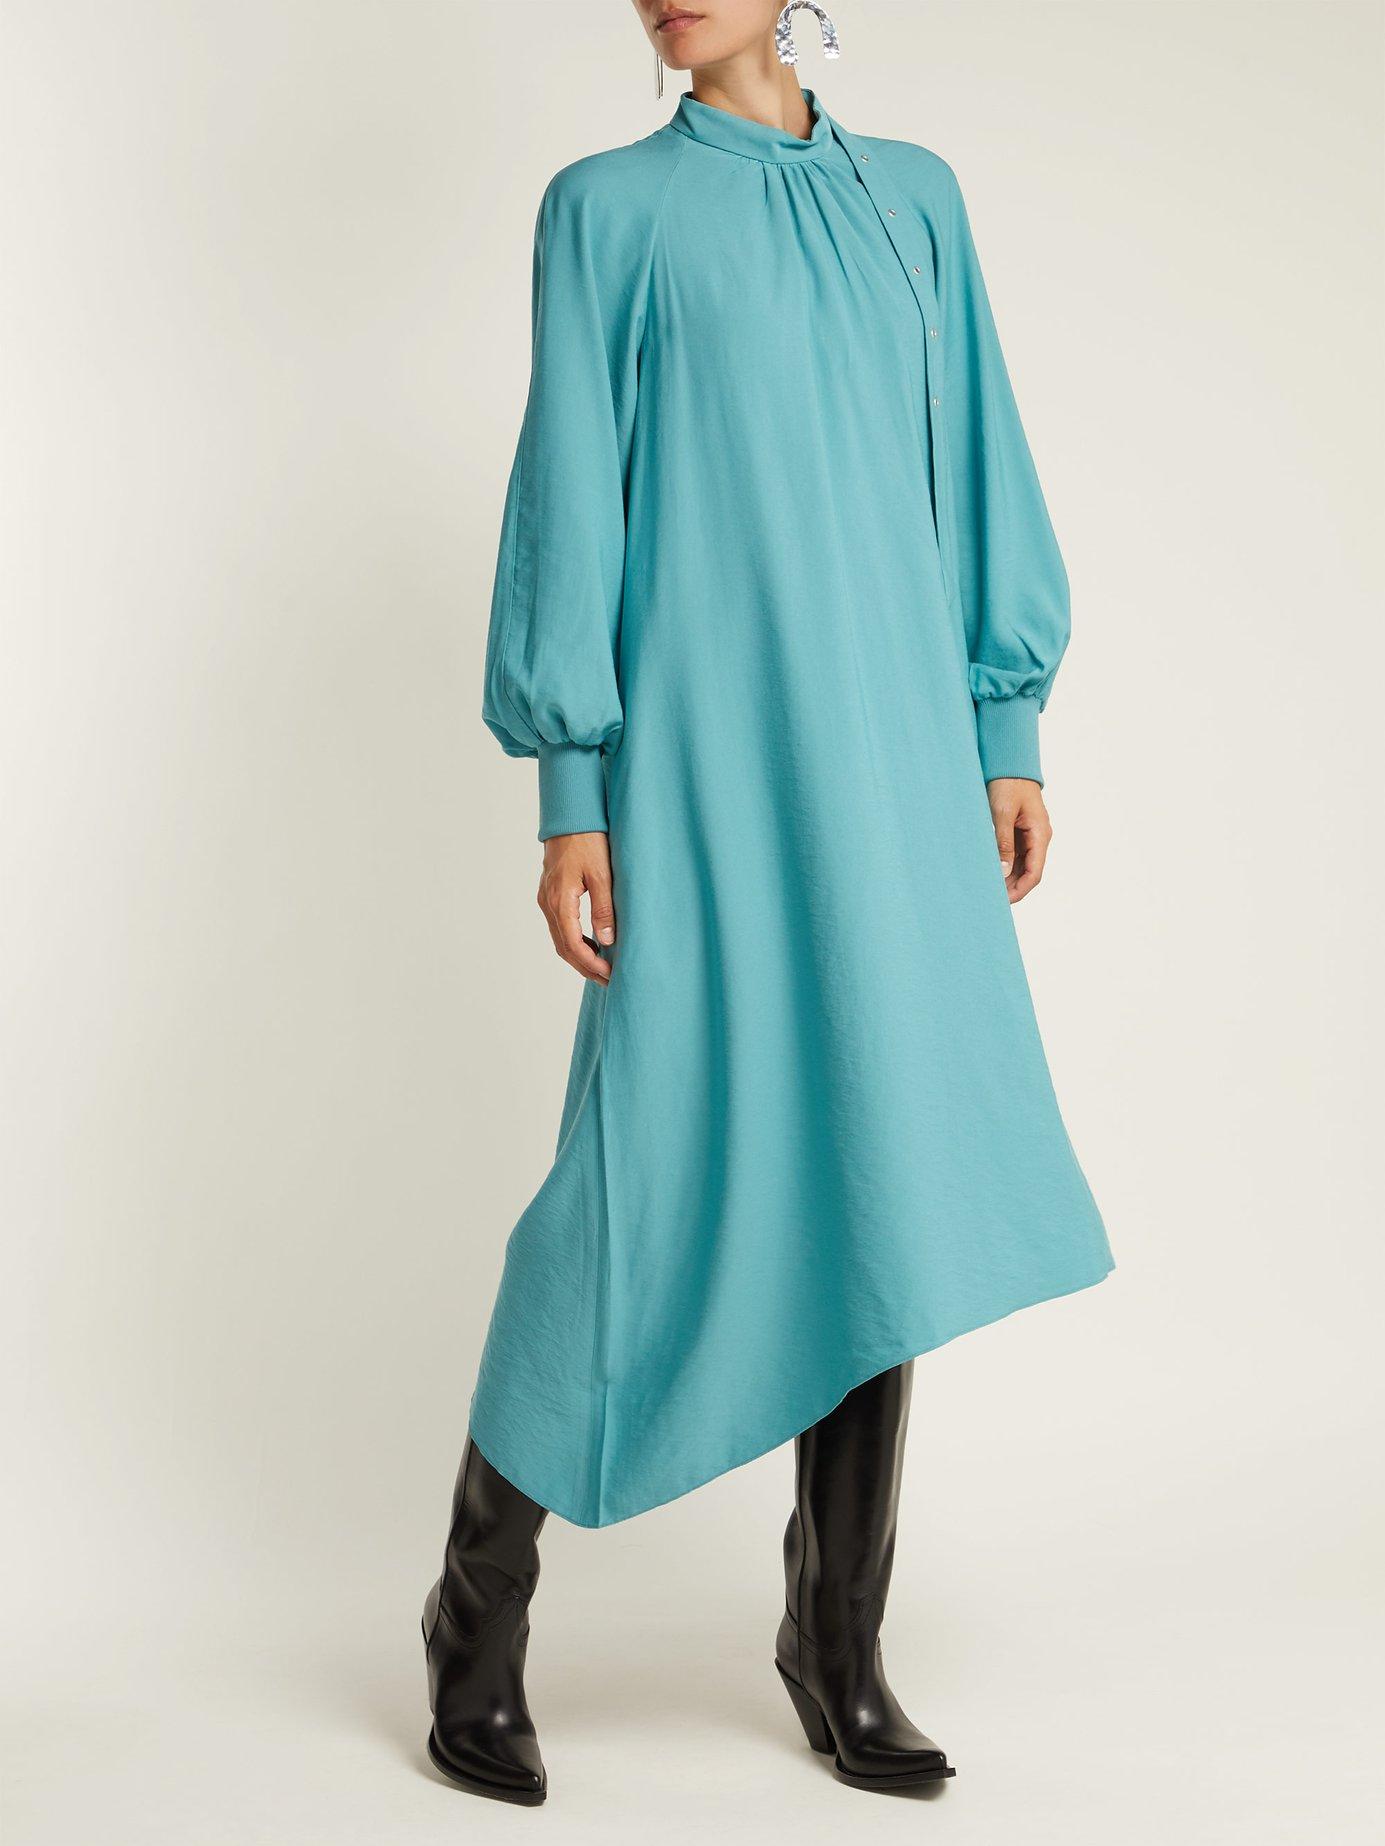 High-neck asymmetric twill dress by Tibi